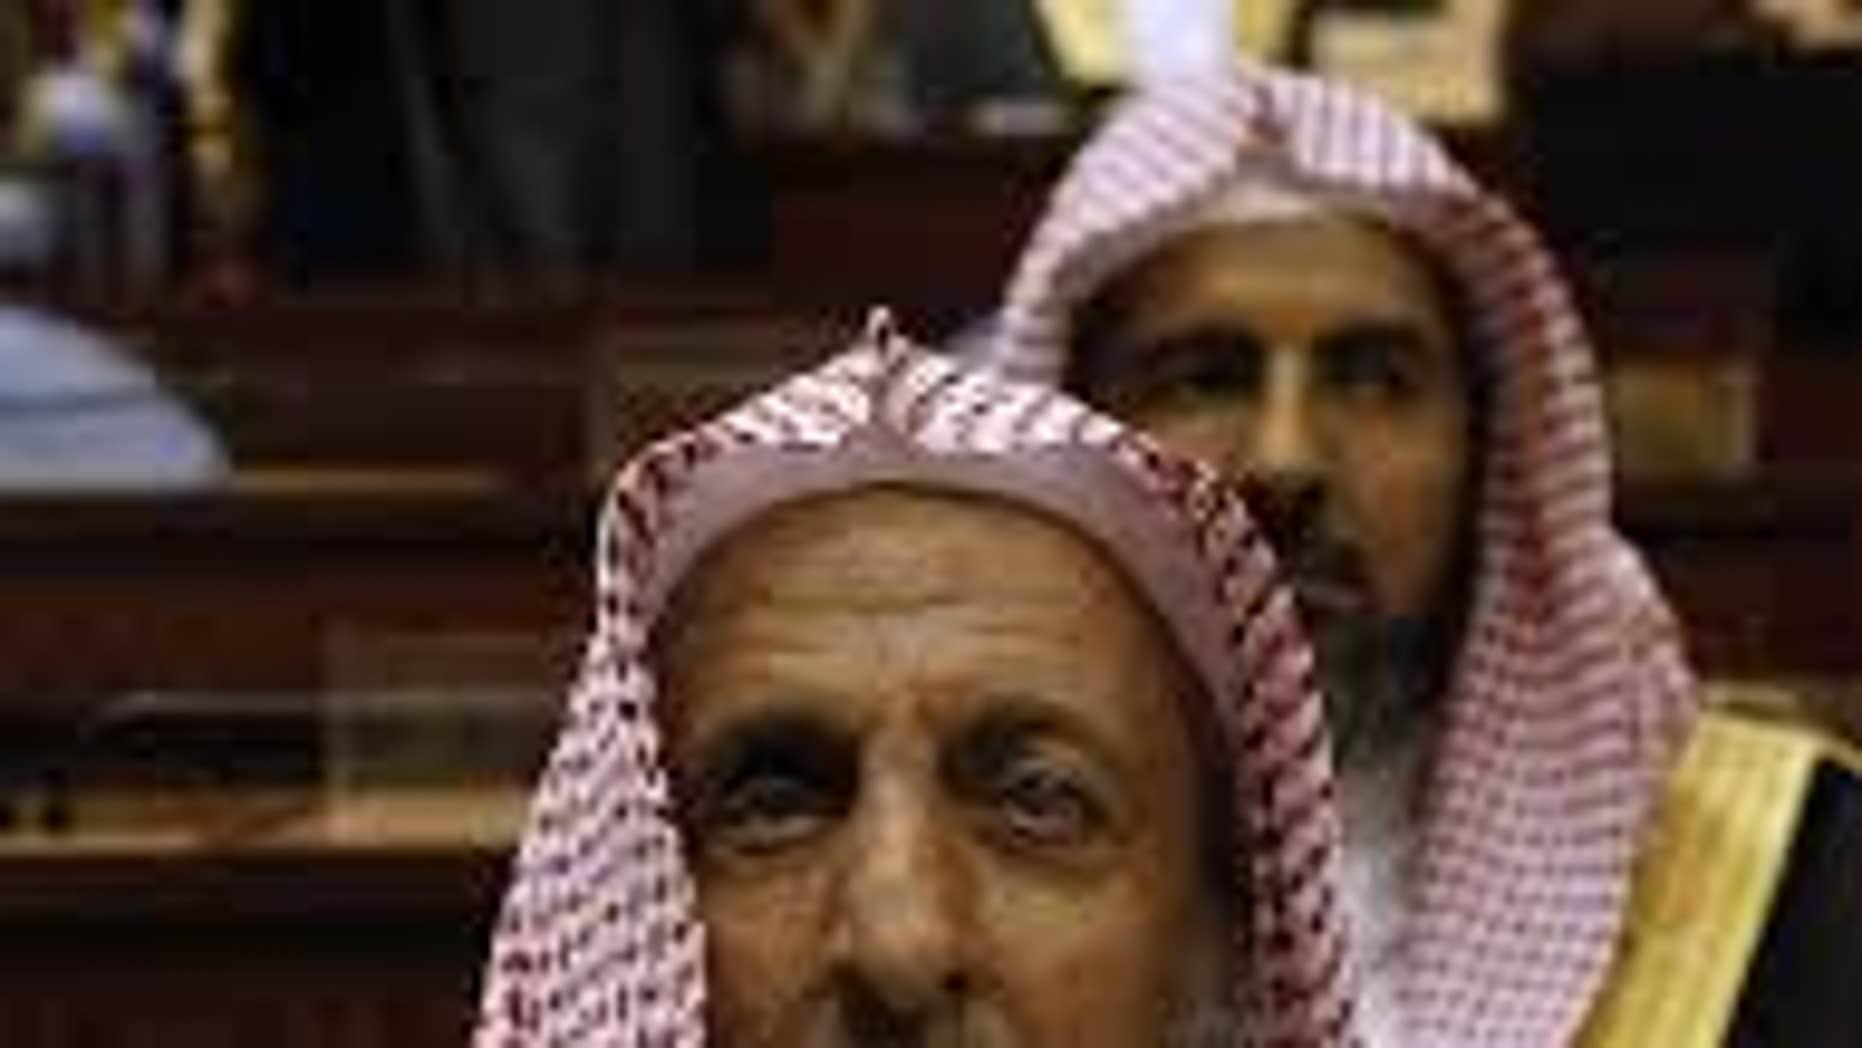 Sheikh Abdul Aziz al-Sheikh in 2009.